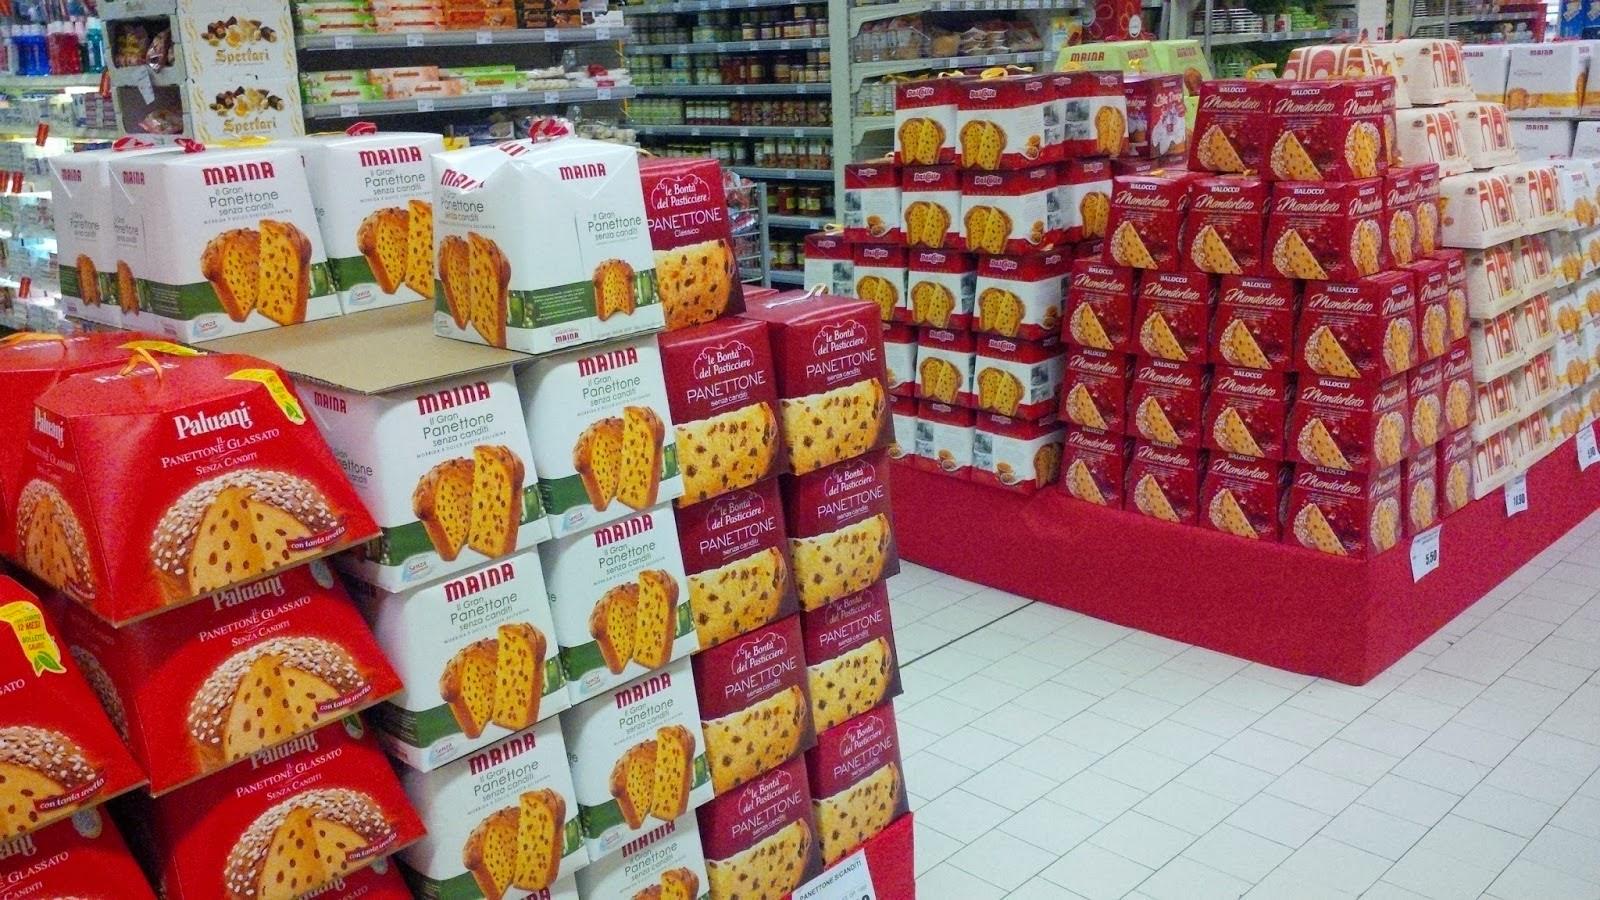 Scrumptious panettone in an Italian supermarket